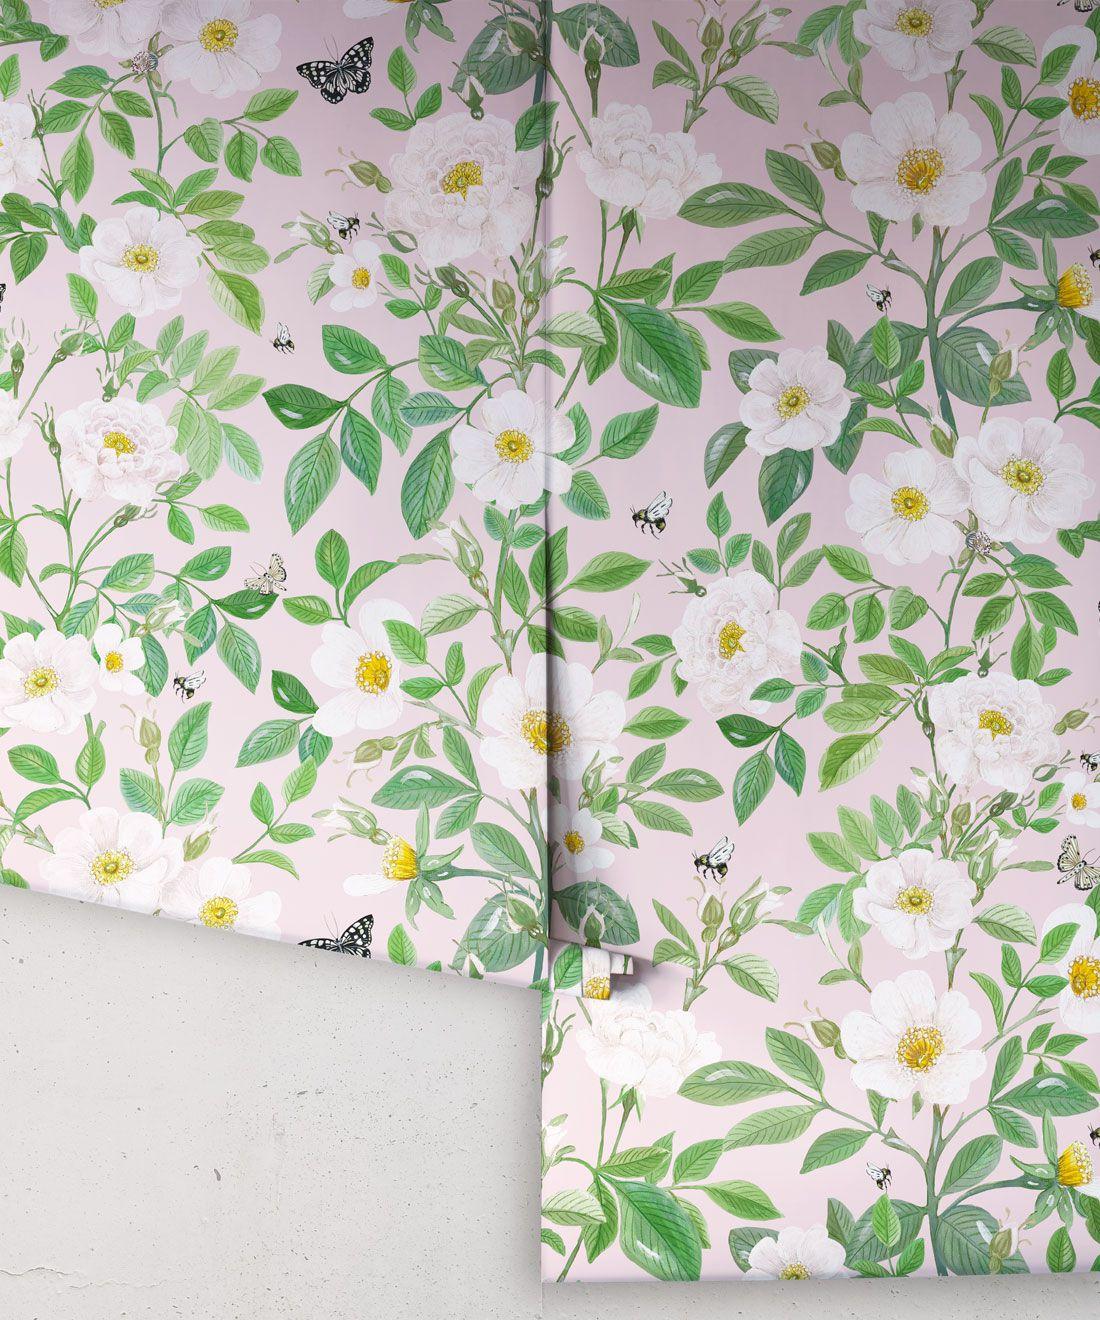 Rosa Wallpaper • Floral Wallpaper • Blush •Rolls